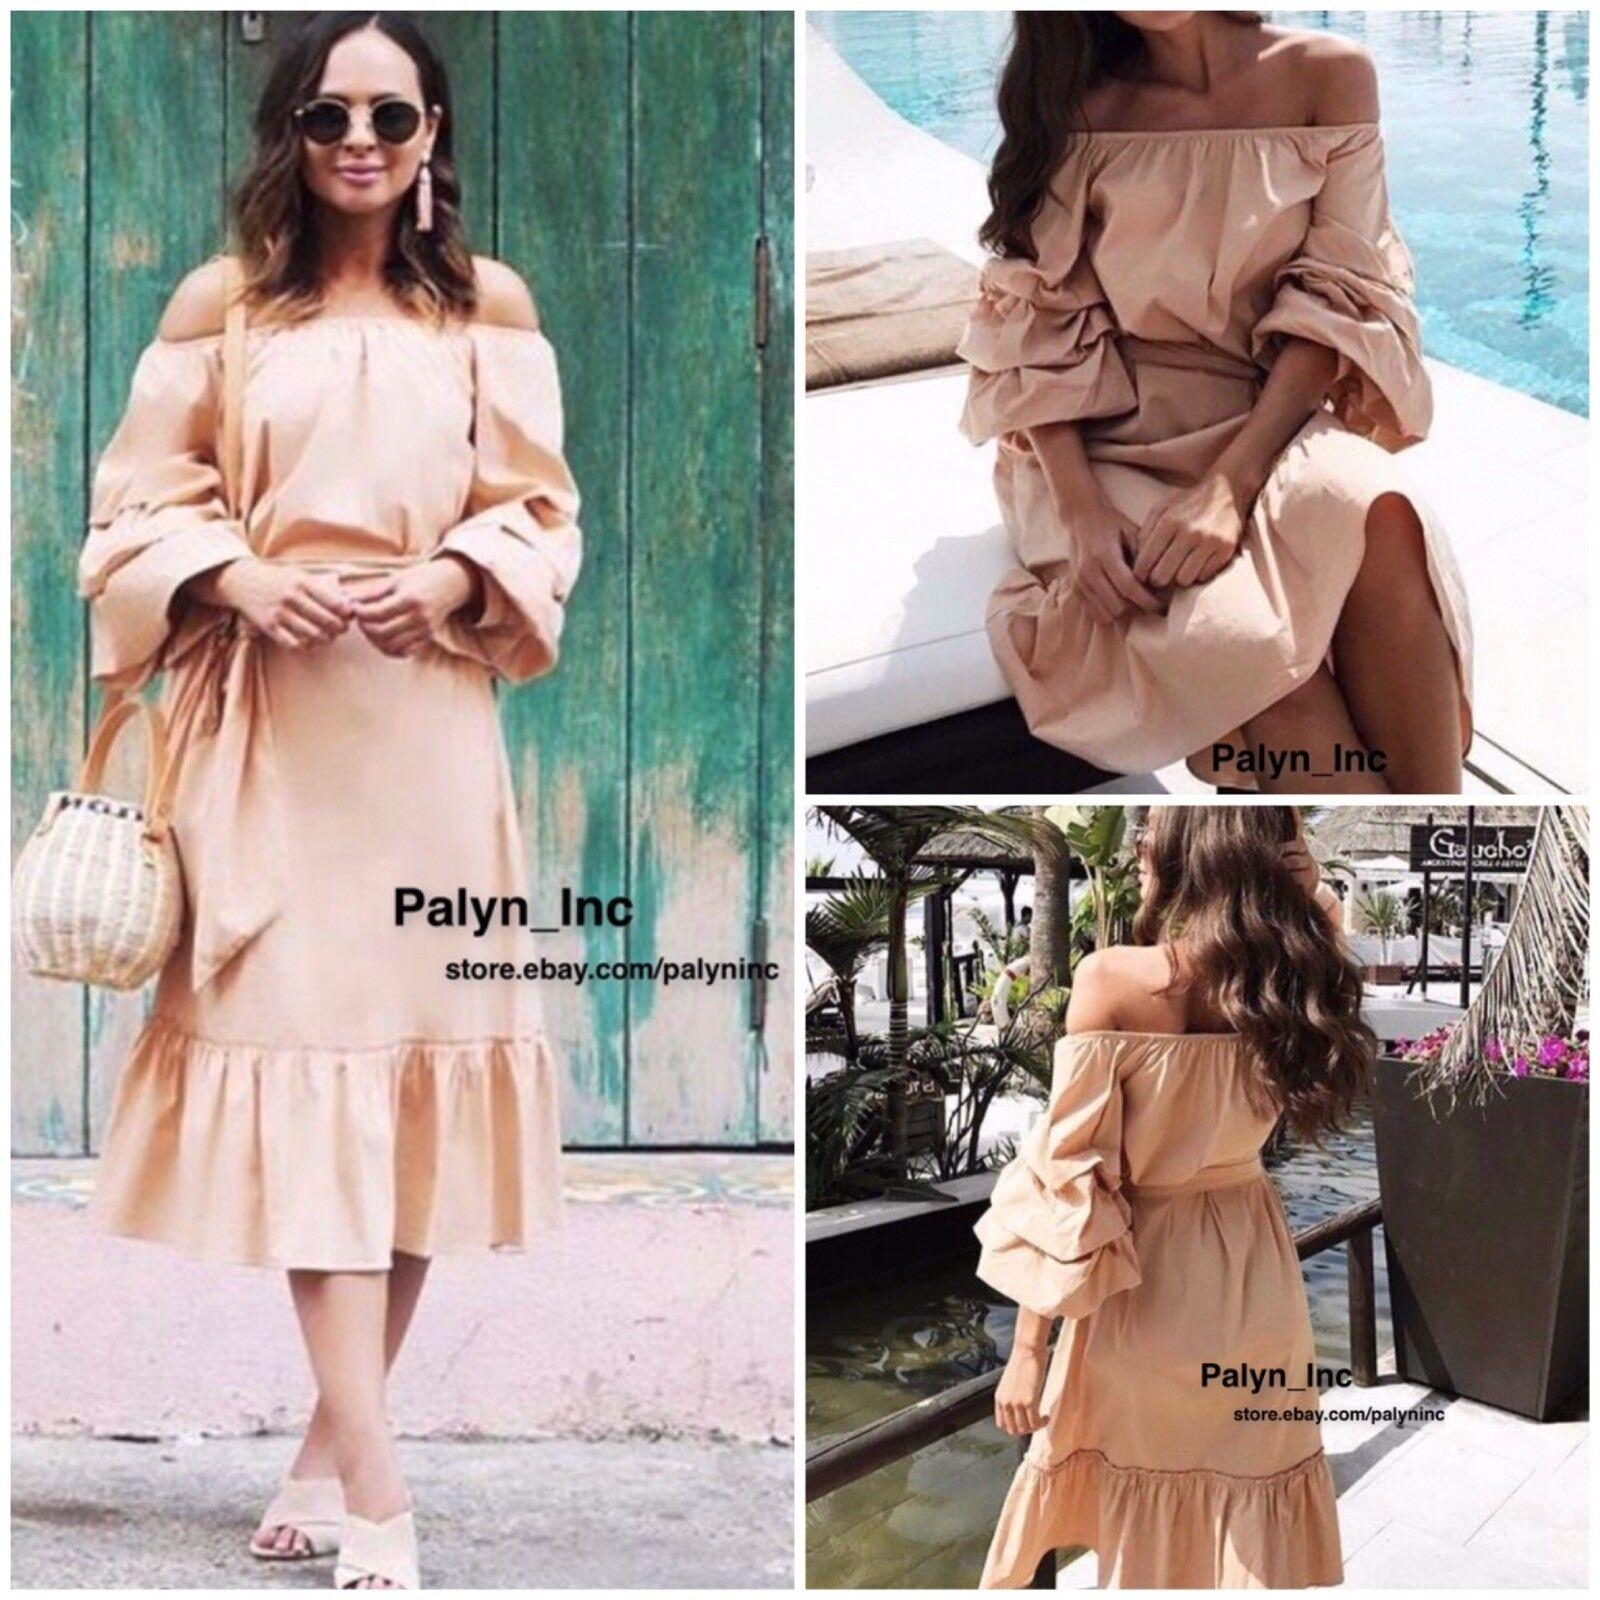 Nwt Zara Ss17 Hautfarben Schulterfrei Popelin Midi Kleid Ref.4437 080 _ S M L